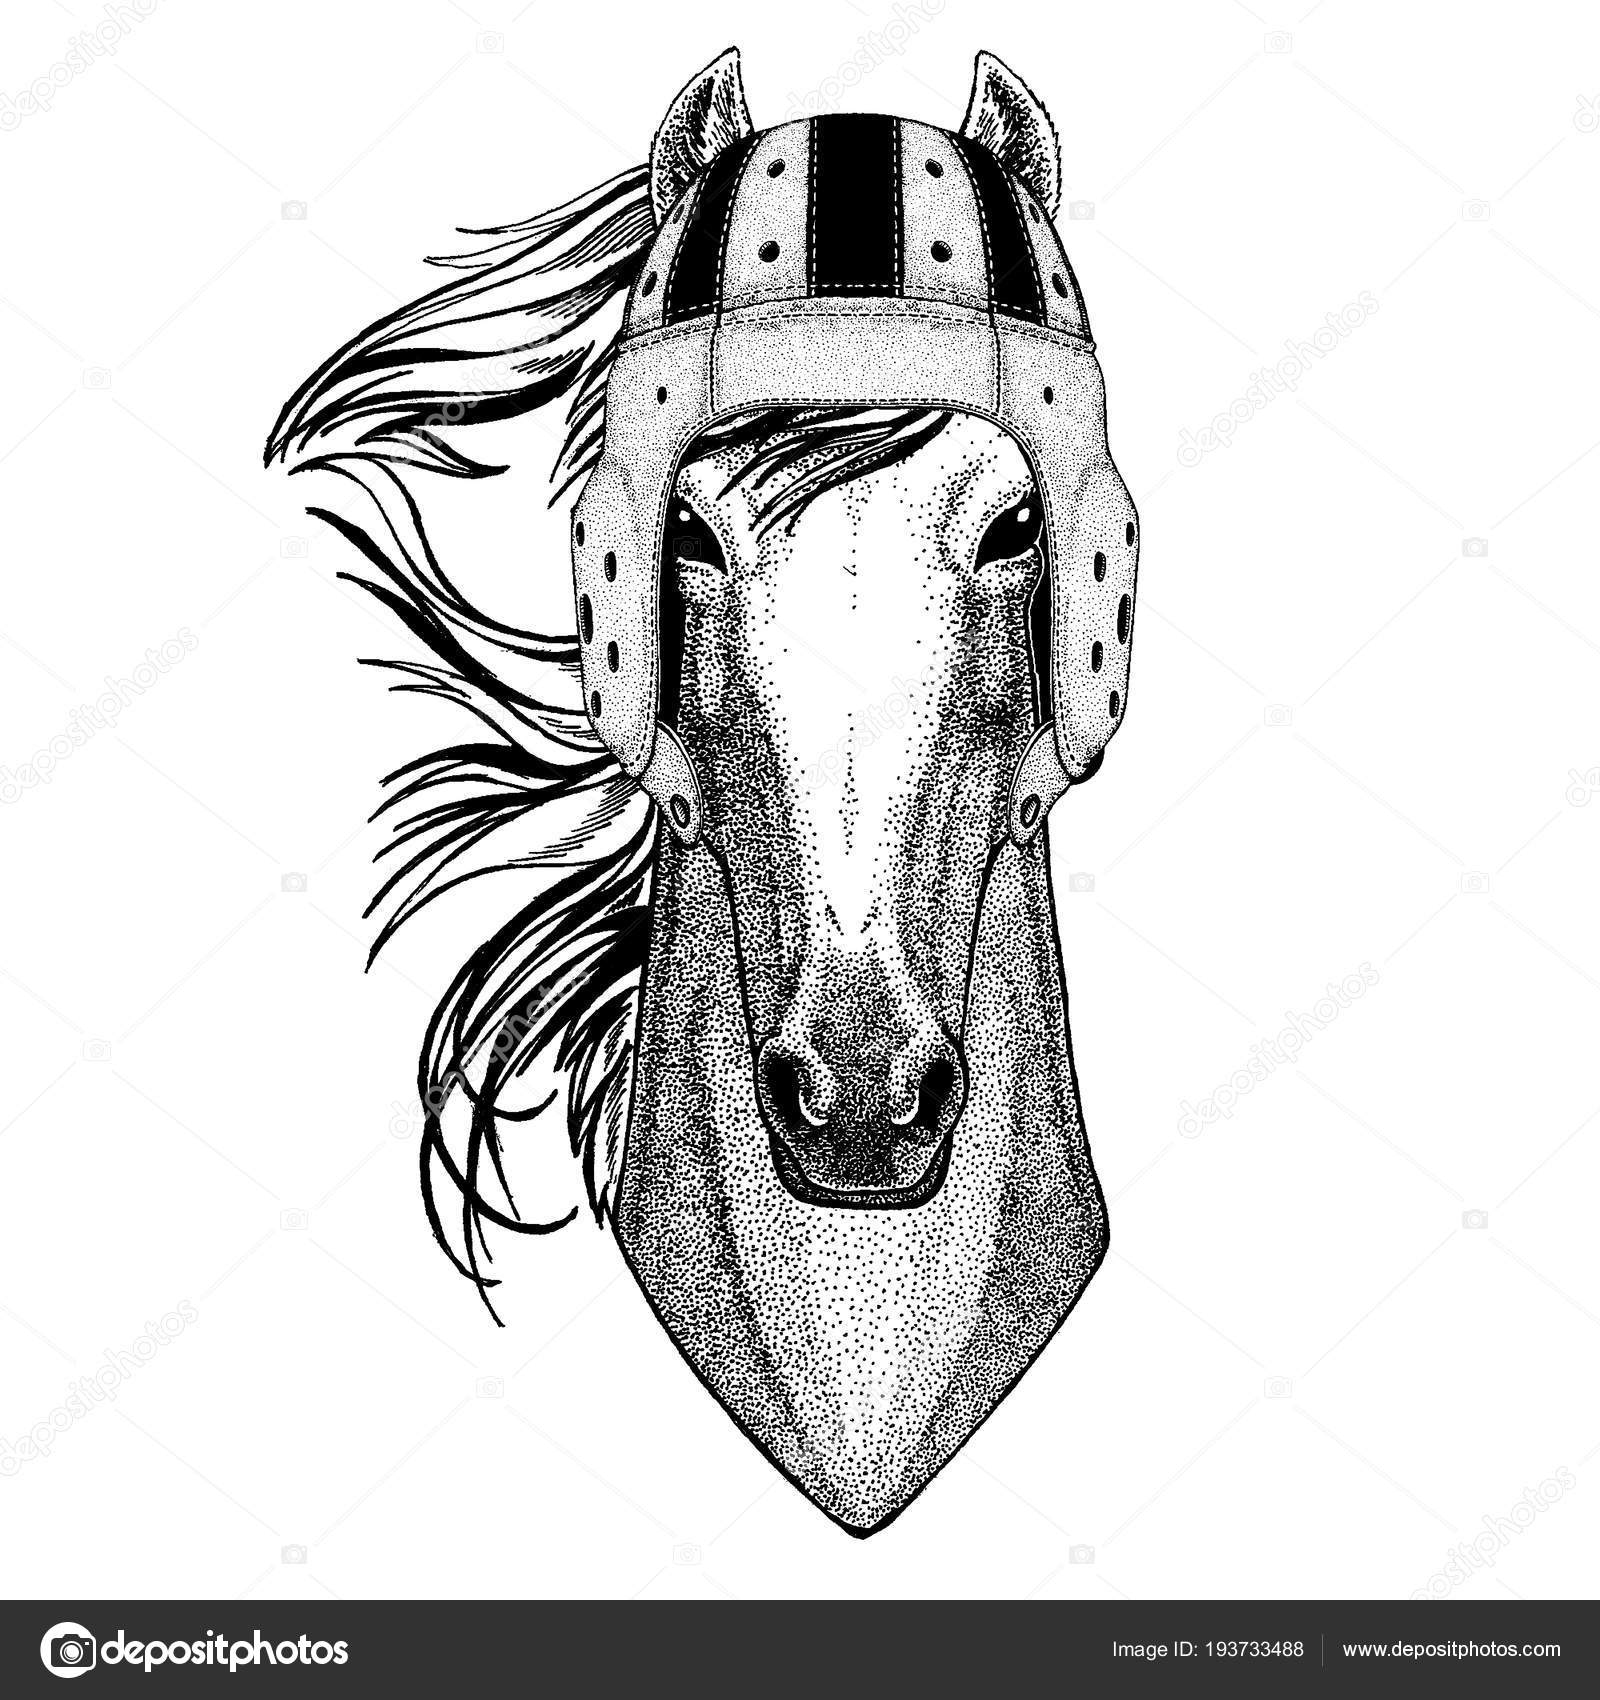 Coole Tiere Tragen Helm Extremsport Rugbyspiel Pferd Hoss Ritter